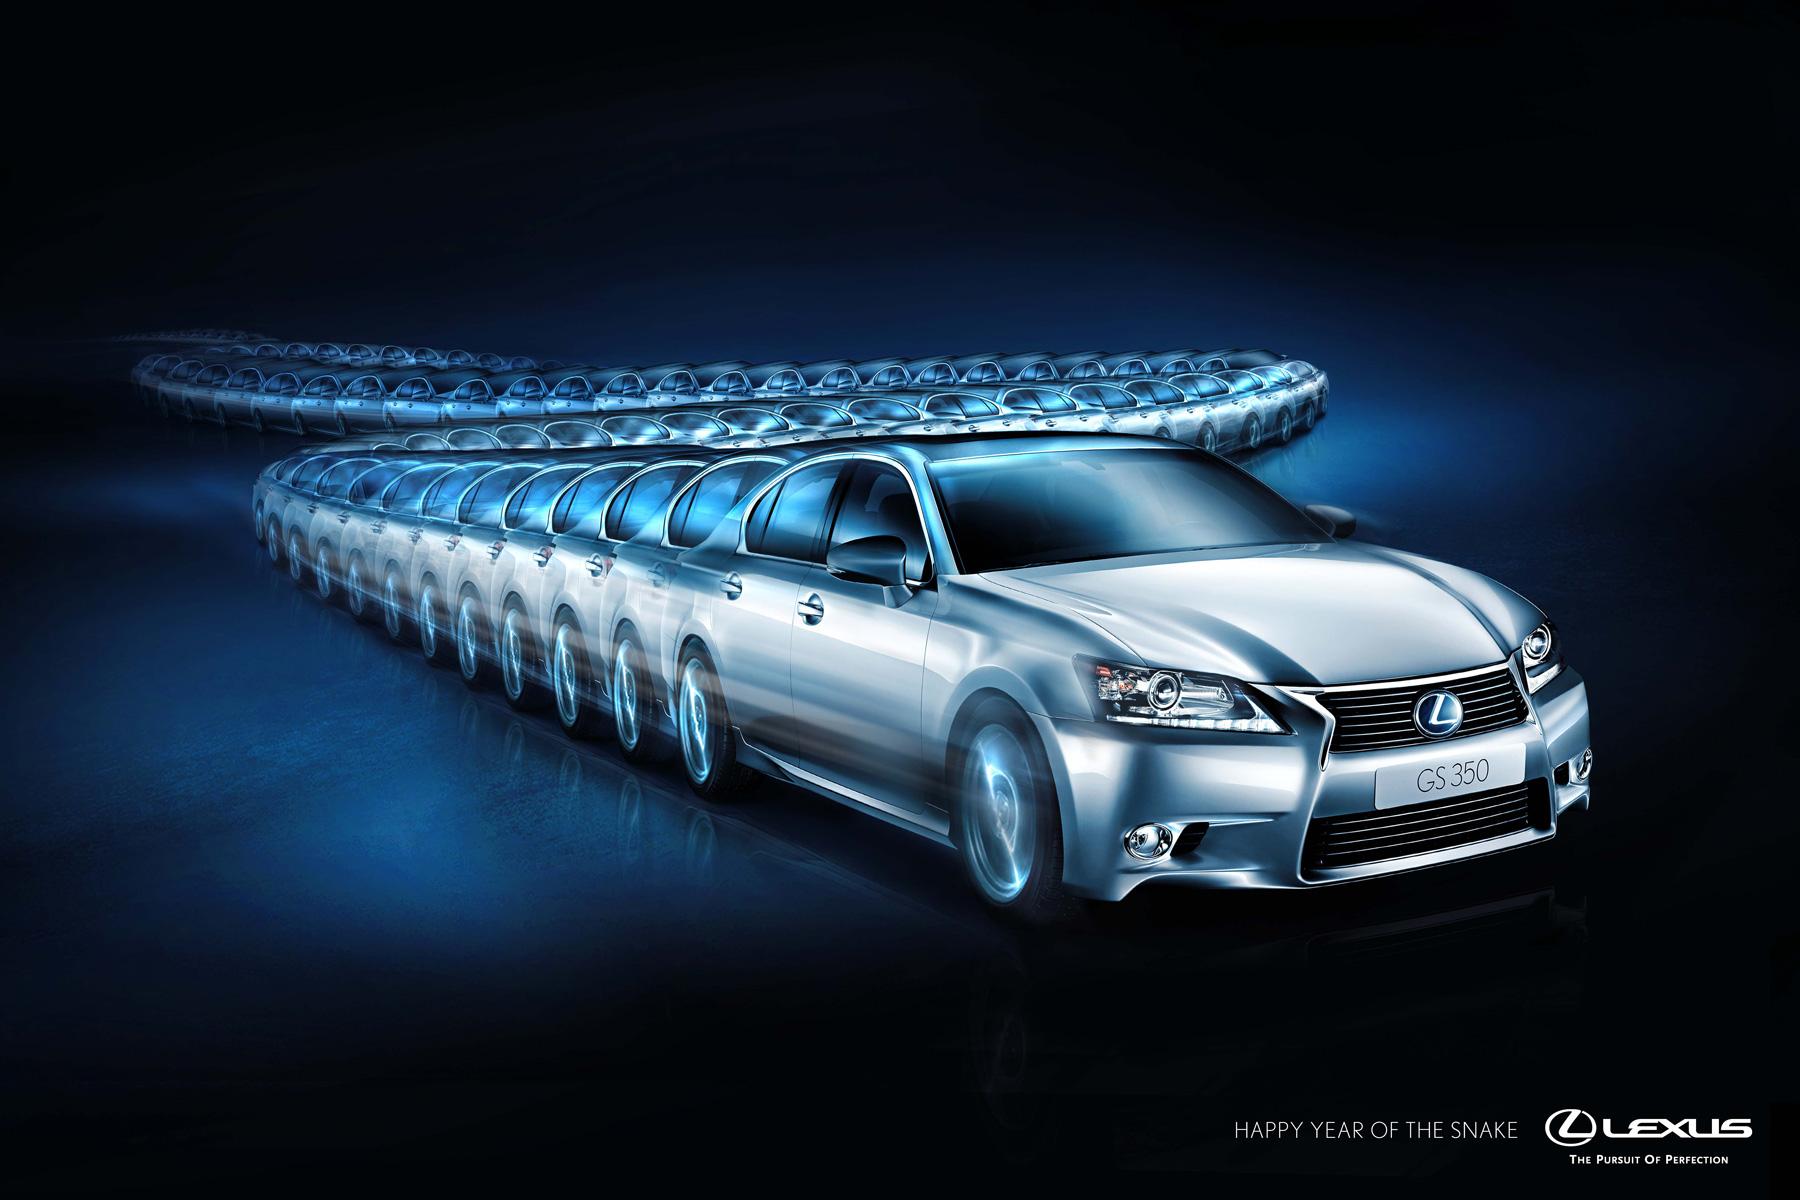 Lexus Print Advert By Saatchi & Saatchi: Lexus Chinese New ...